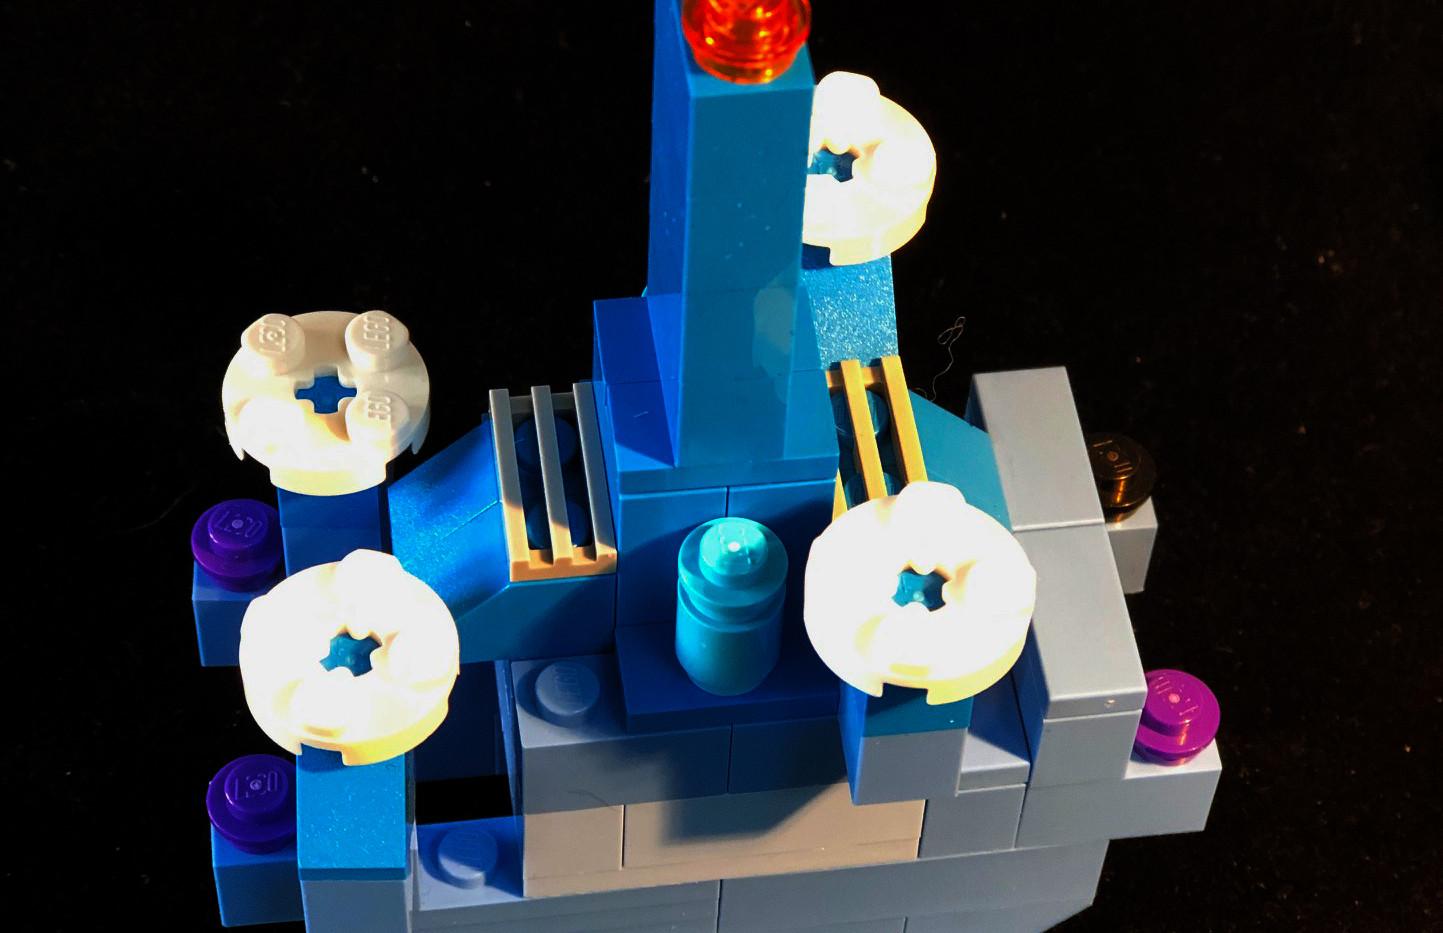 LEtitGO--Blue Flower Power by Thomas Moraitis